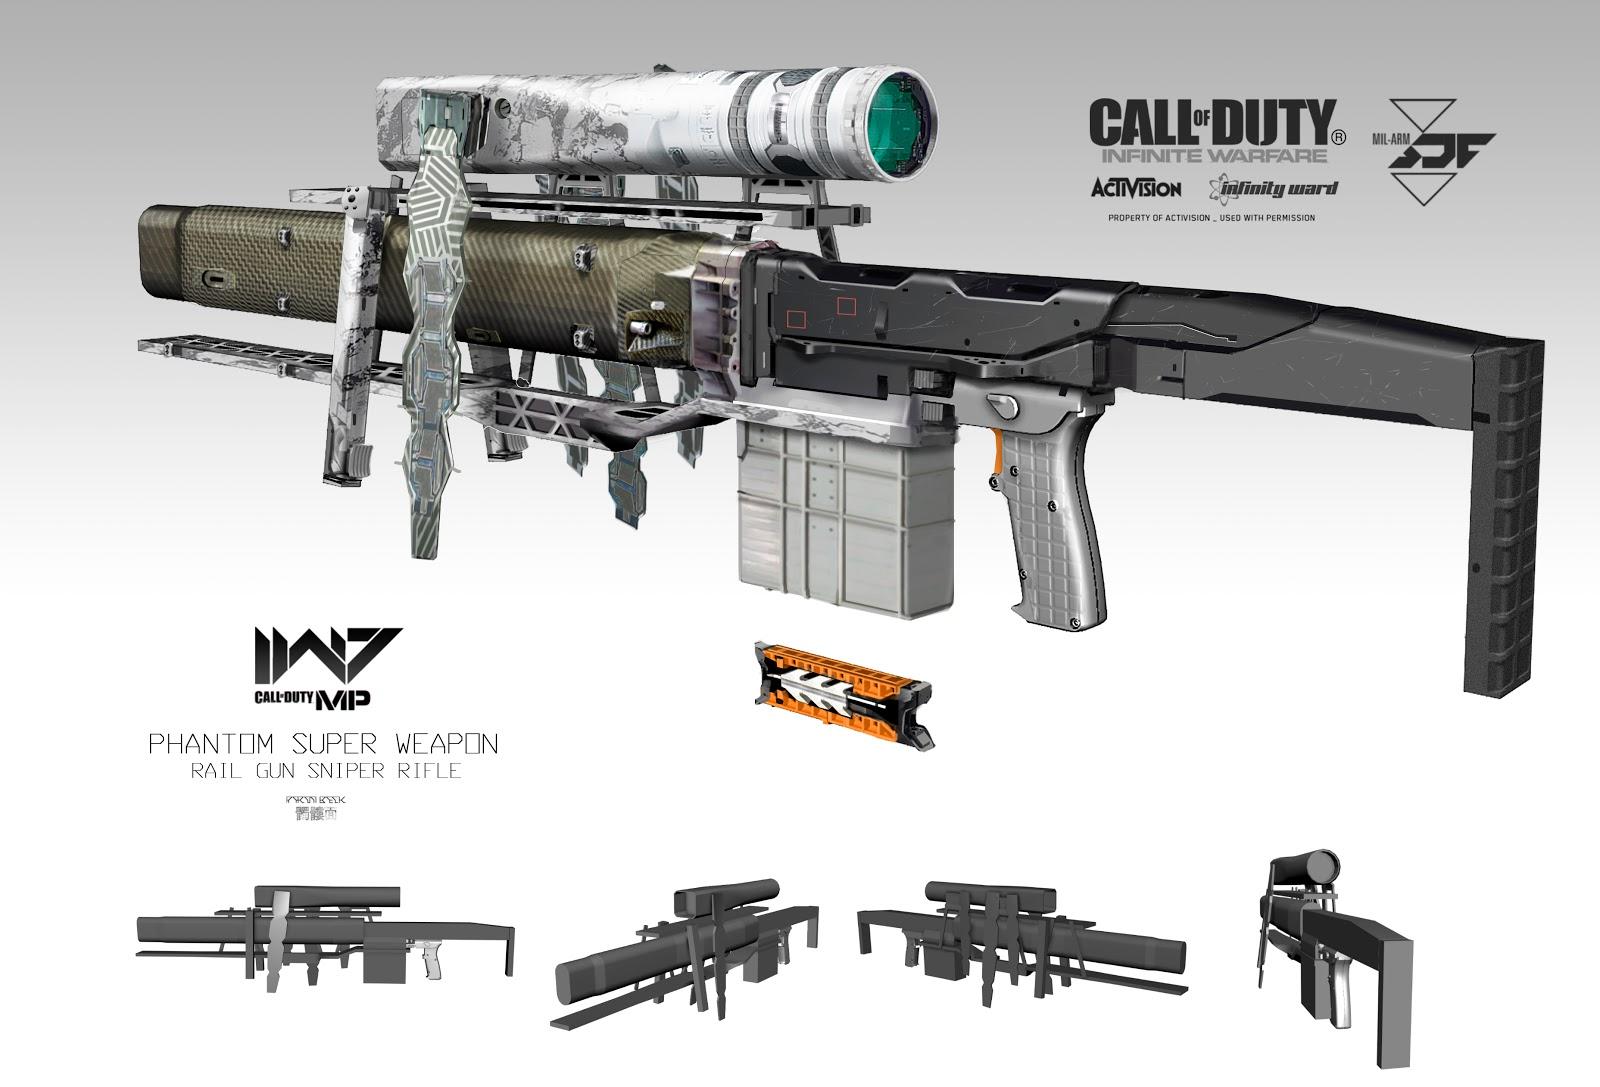 CODIW_Phantom_rifle_01.jpg